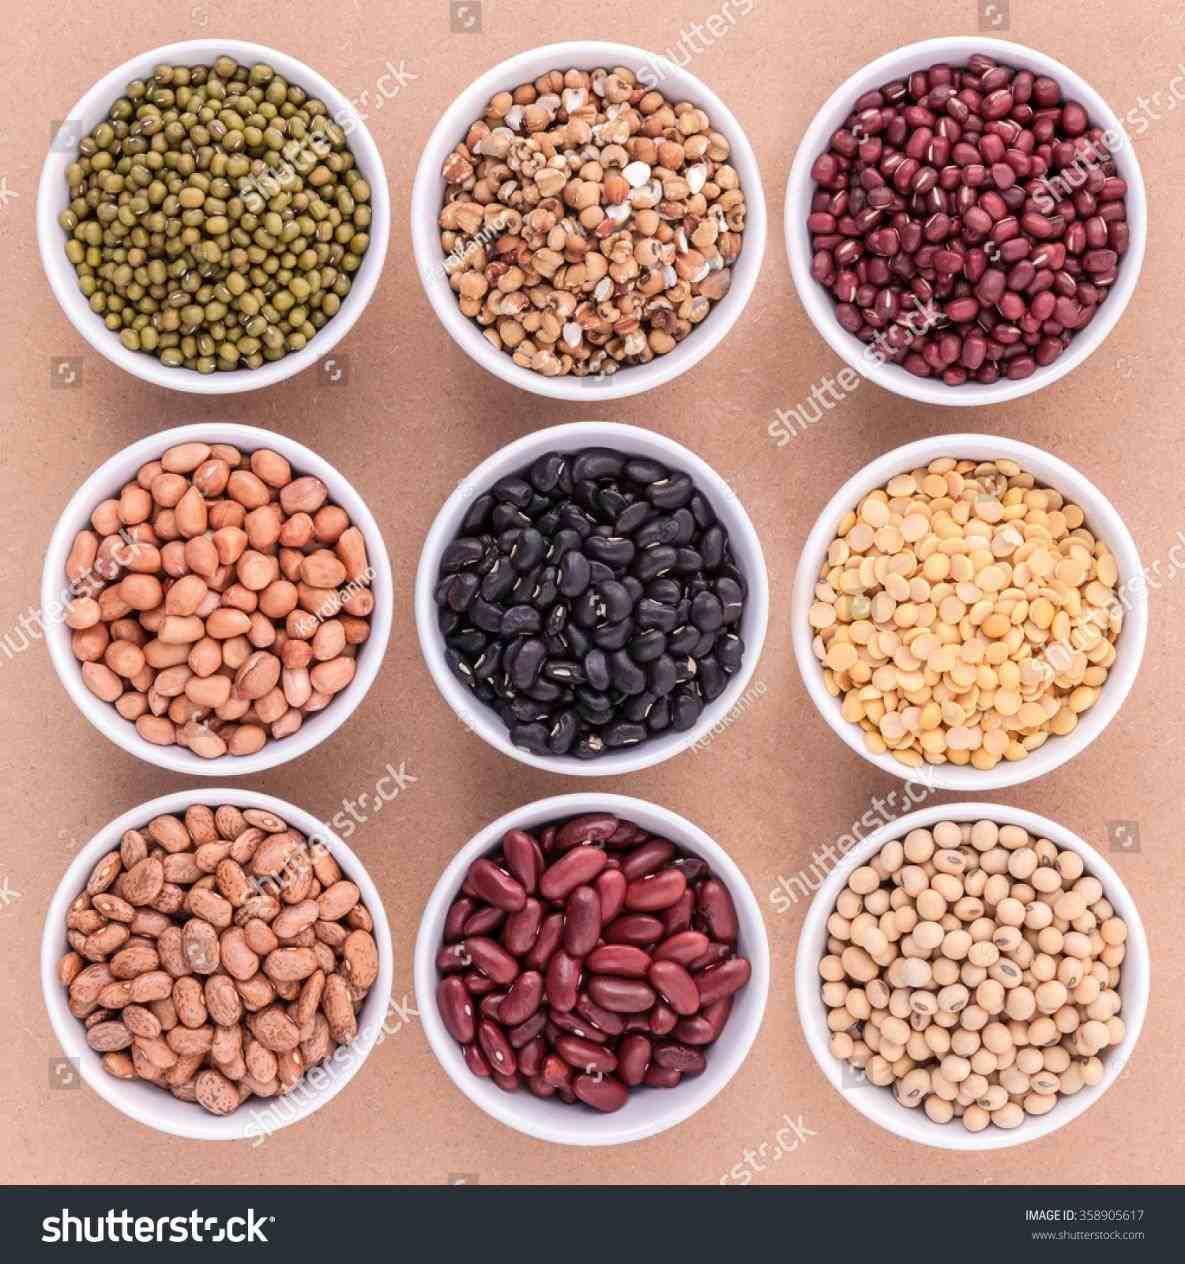 Bag of beans publizzity. Bean clipart pinto bean